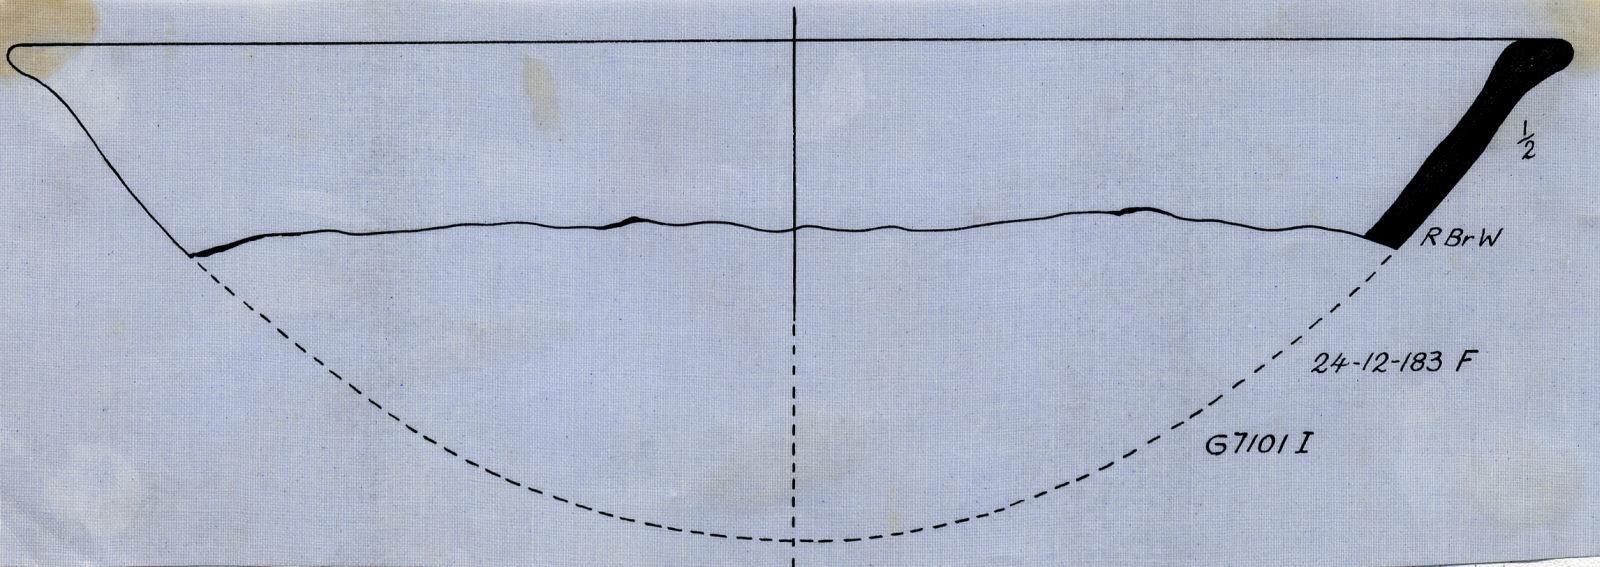 Drawings: G 7101, Shaft I: pottery, bowl